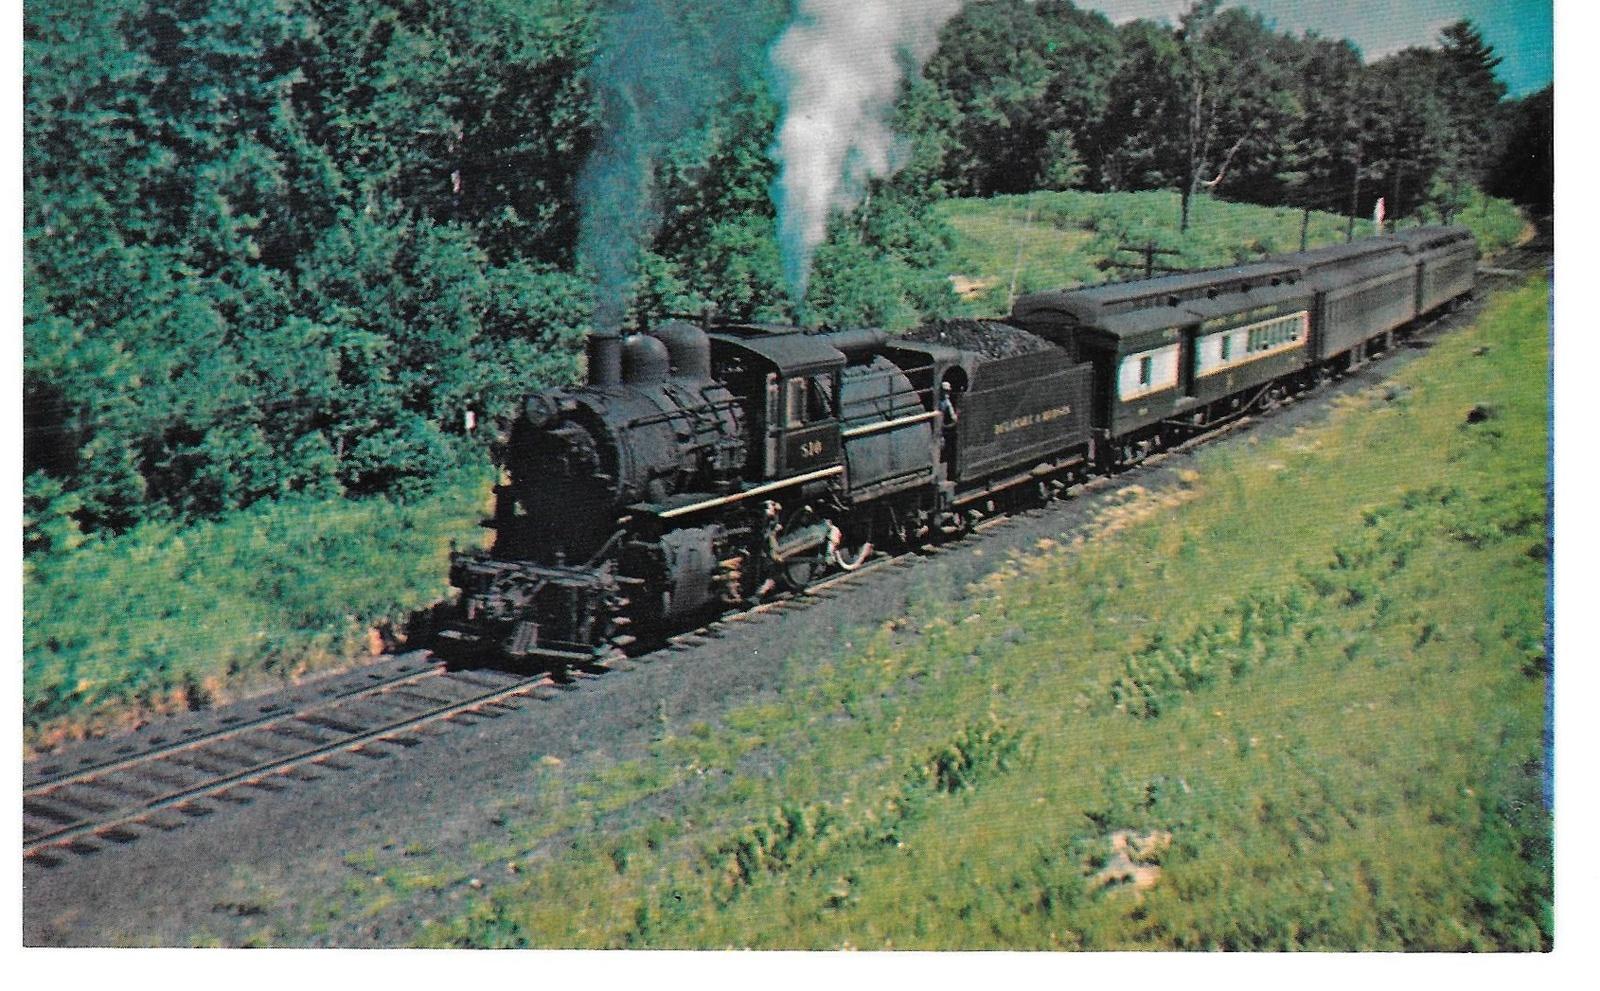 Delaware & Hudson Railroad 810 Camelback and 50 similar items